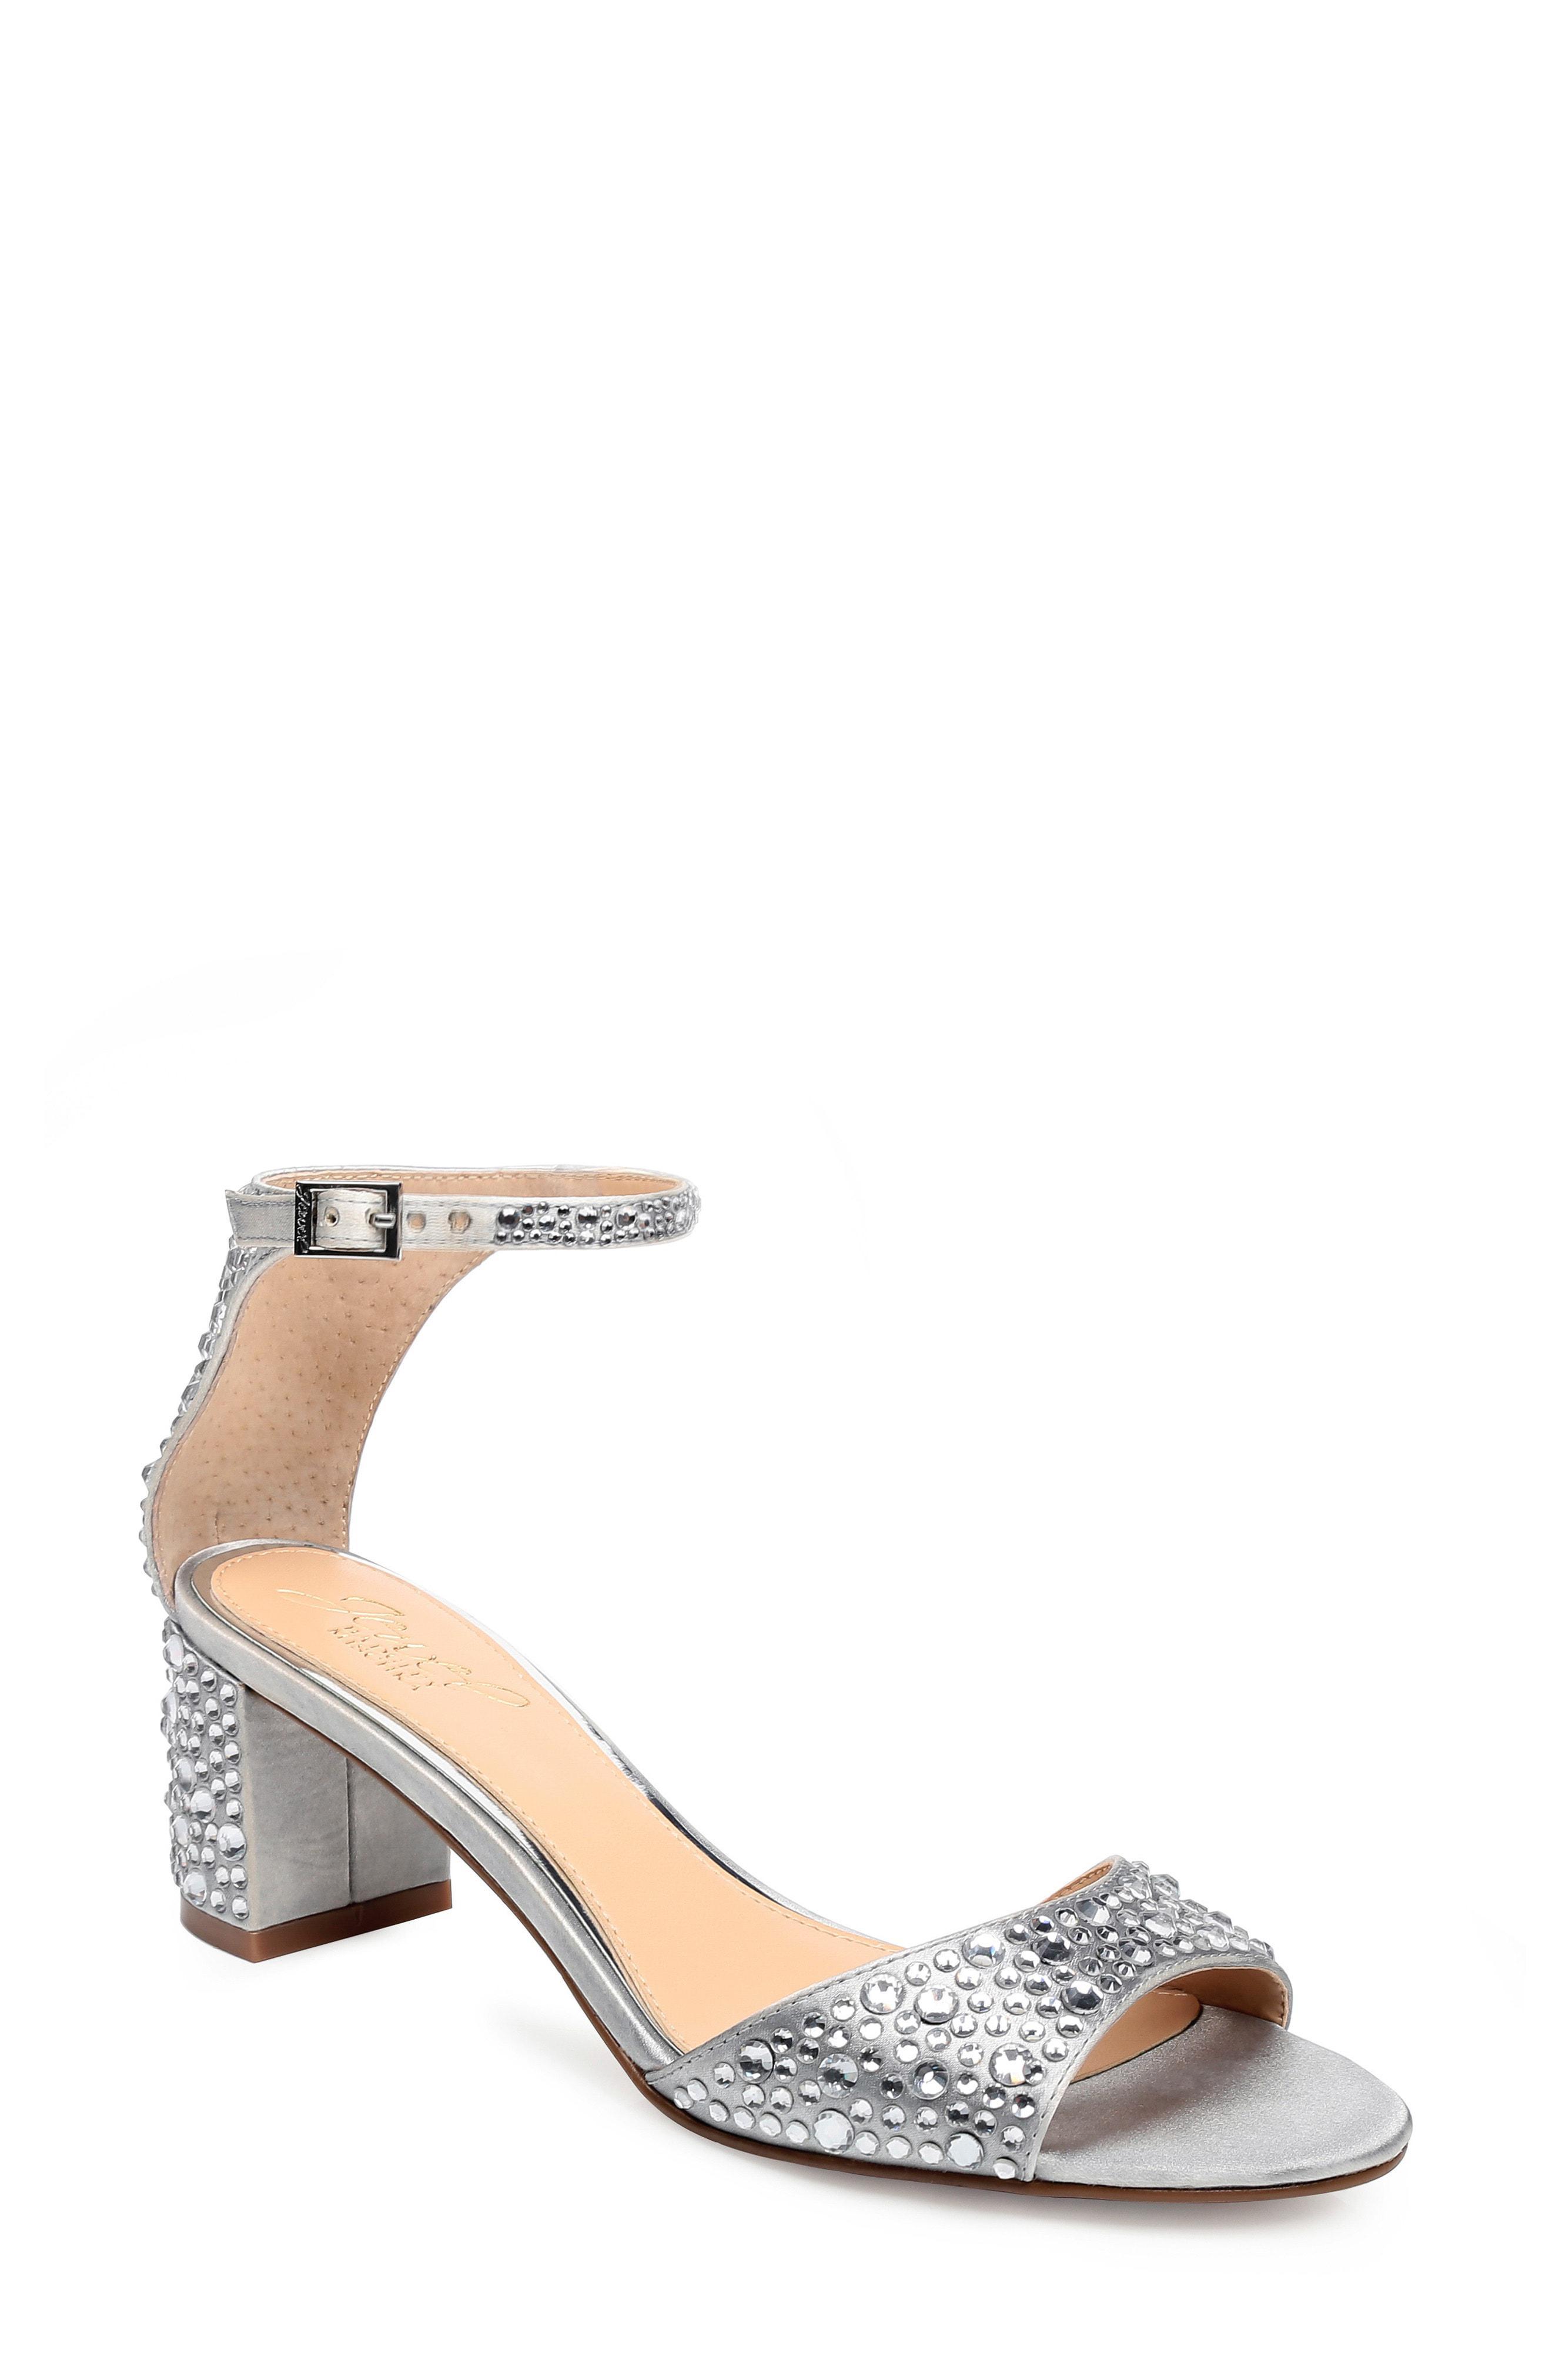 327e9ff4d77 Lyst - Badgley Mischka Crystal Block Heel Sandal in Metallic